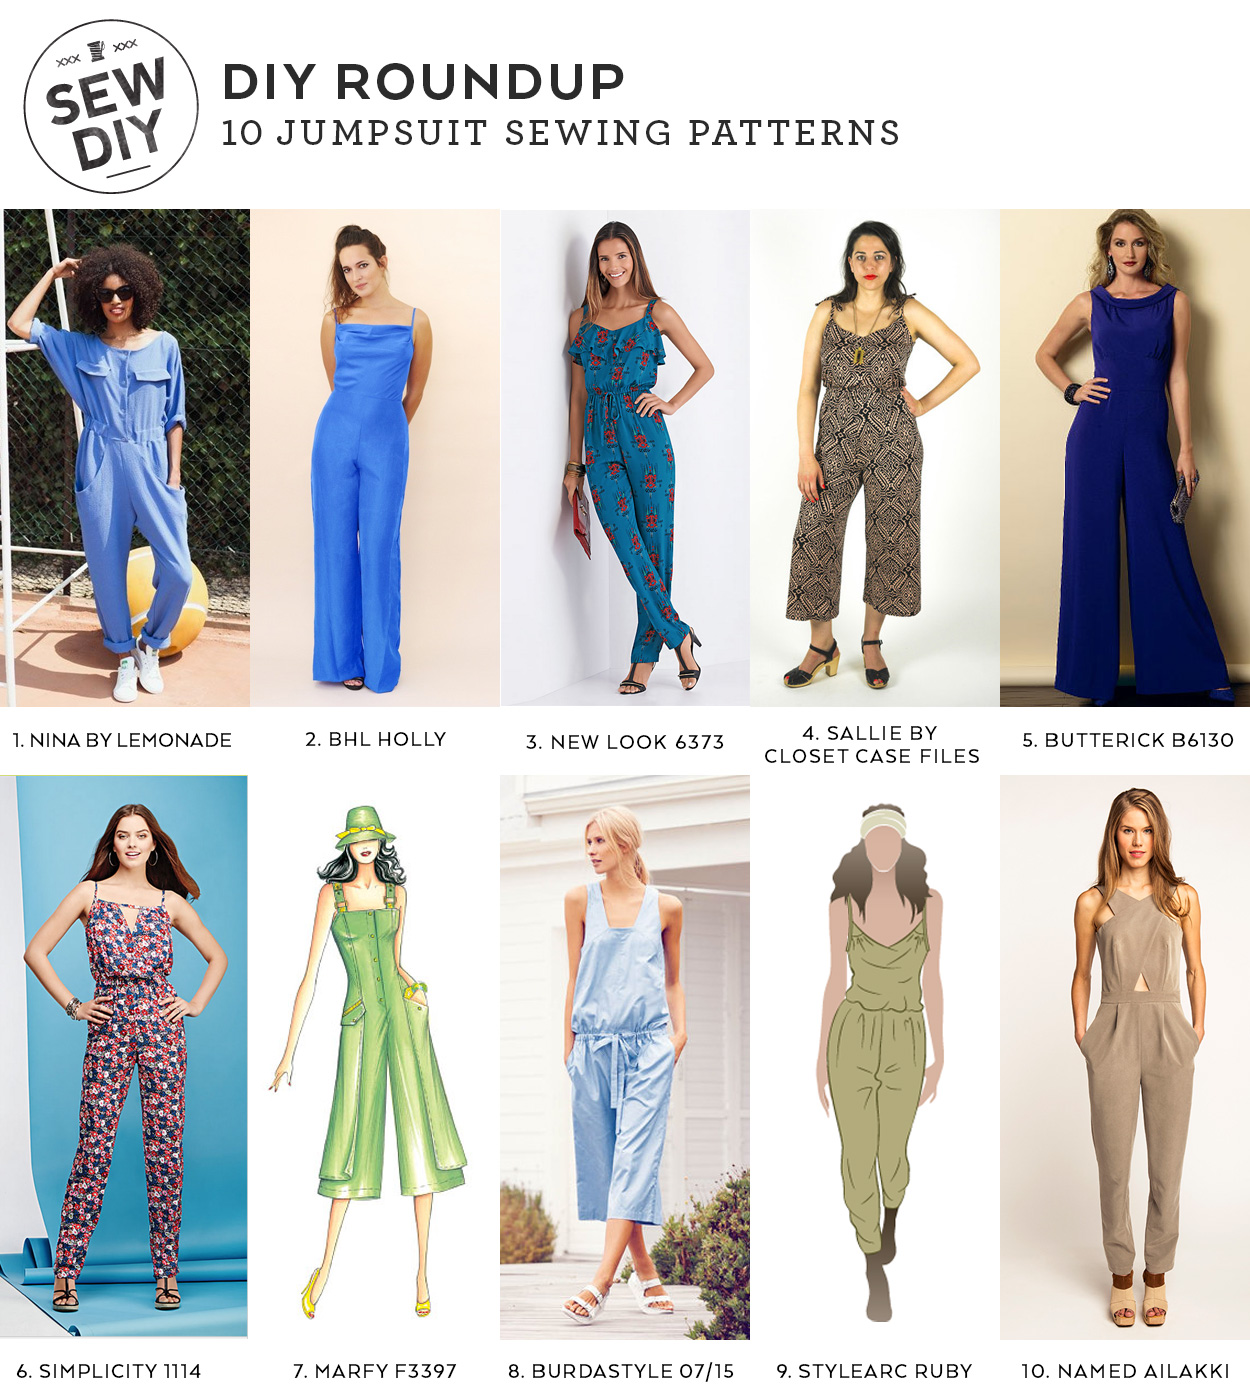 10 Jumpsuit Sewing Patterns | Sew DIY